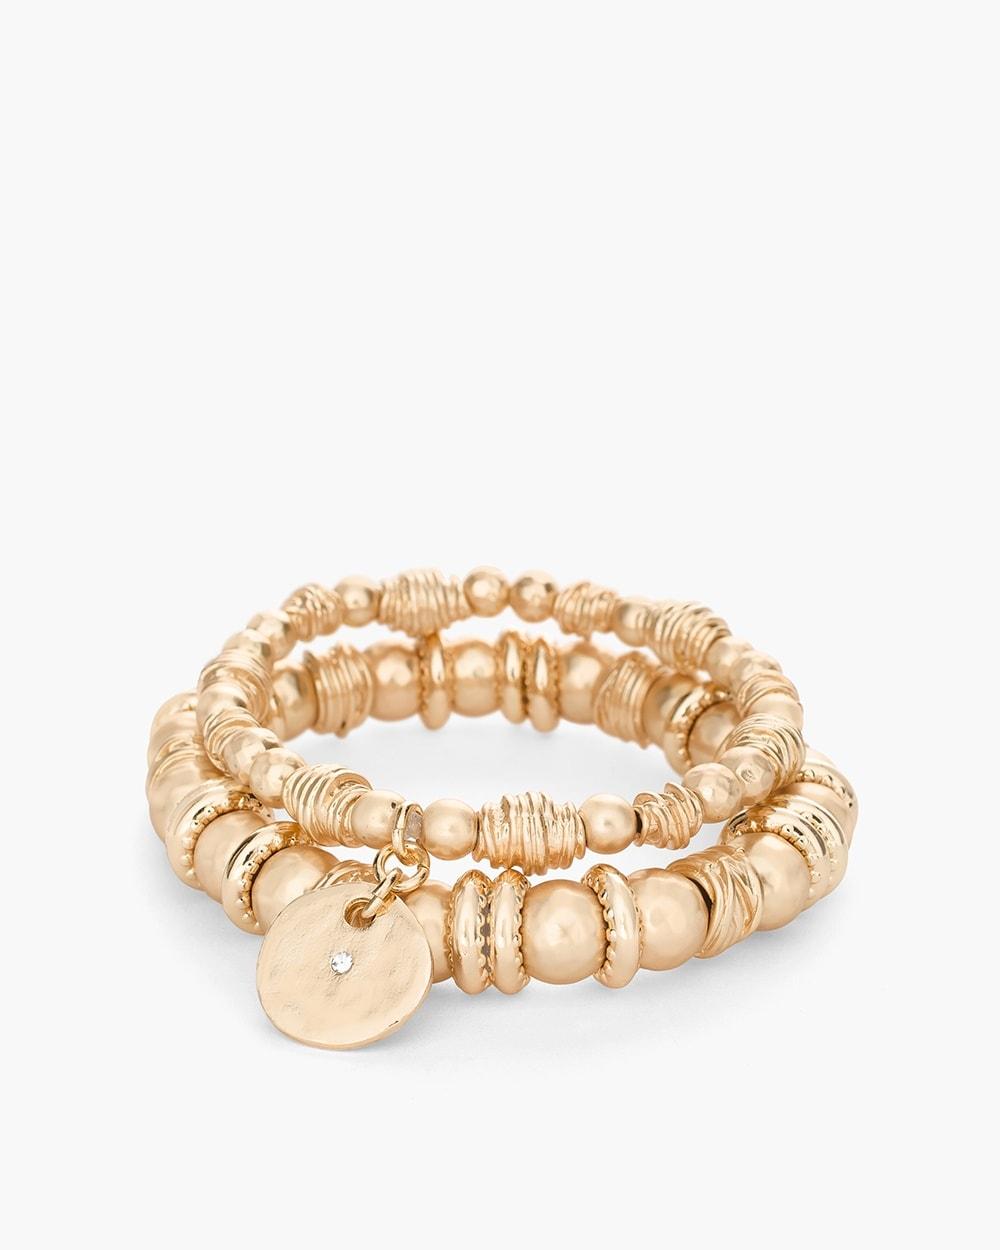 Gold Tone Textured Stretch Bracelet Set